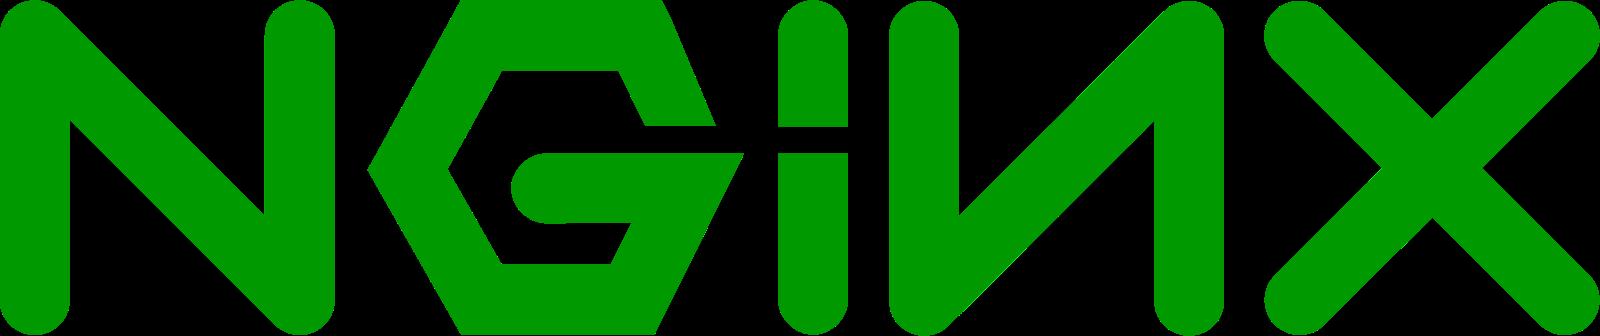 nginx logo 4 - Nginx Logo